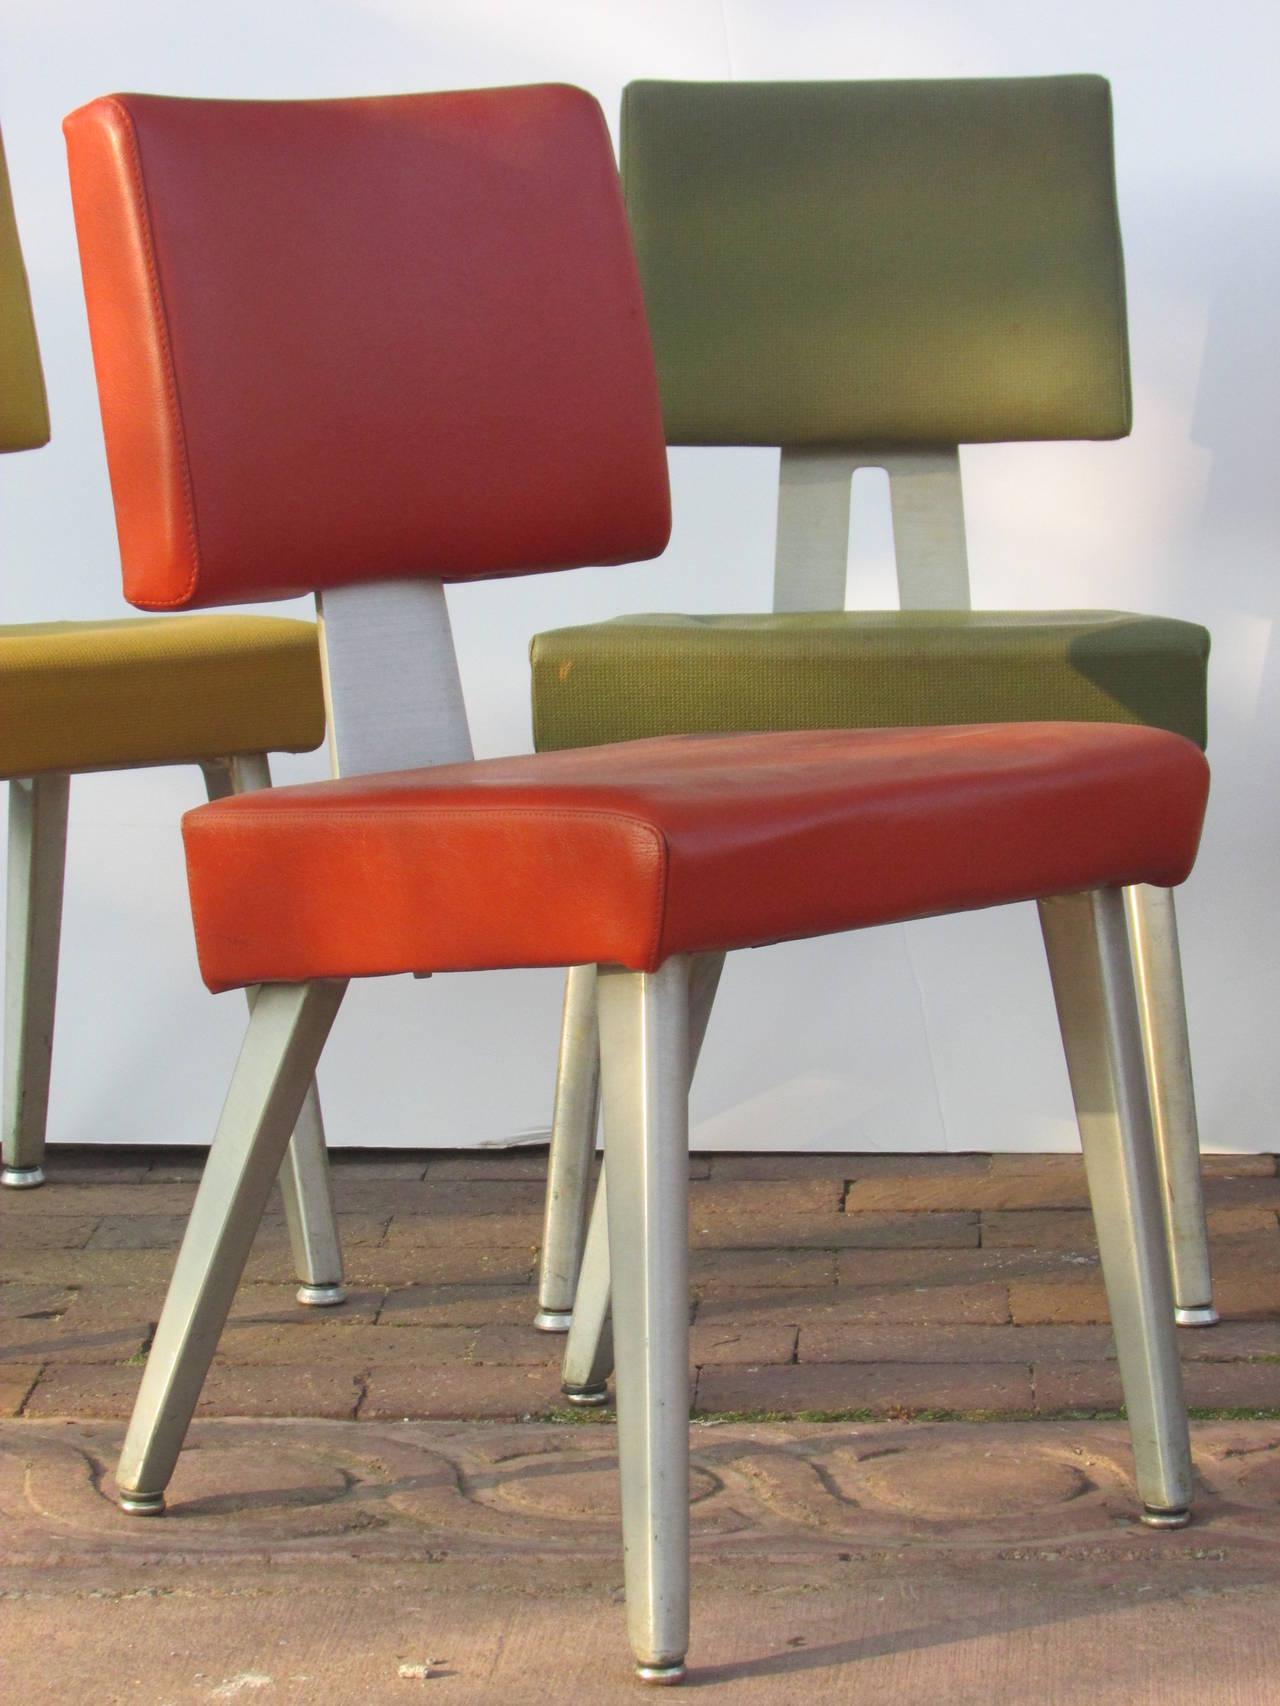 desk chair industrial herman miller office alternative mid century modern goodform task chairs at 1stdibs